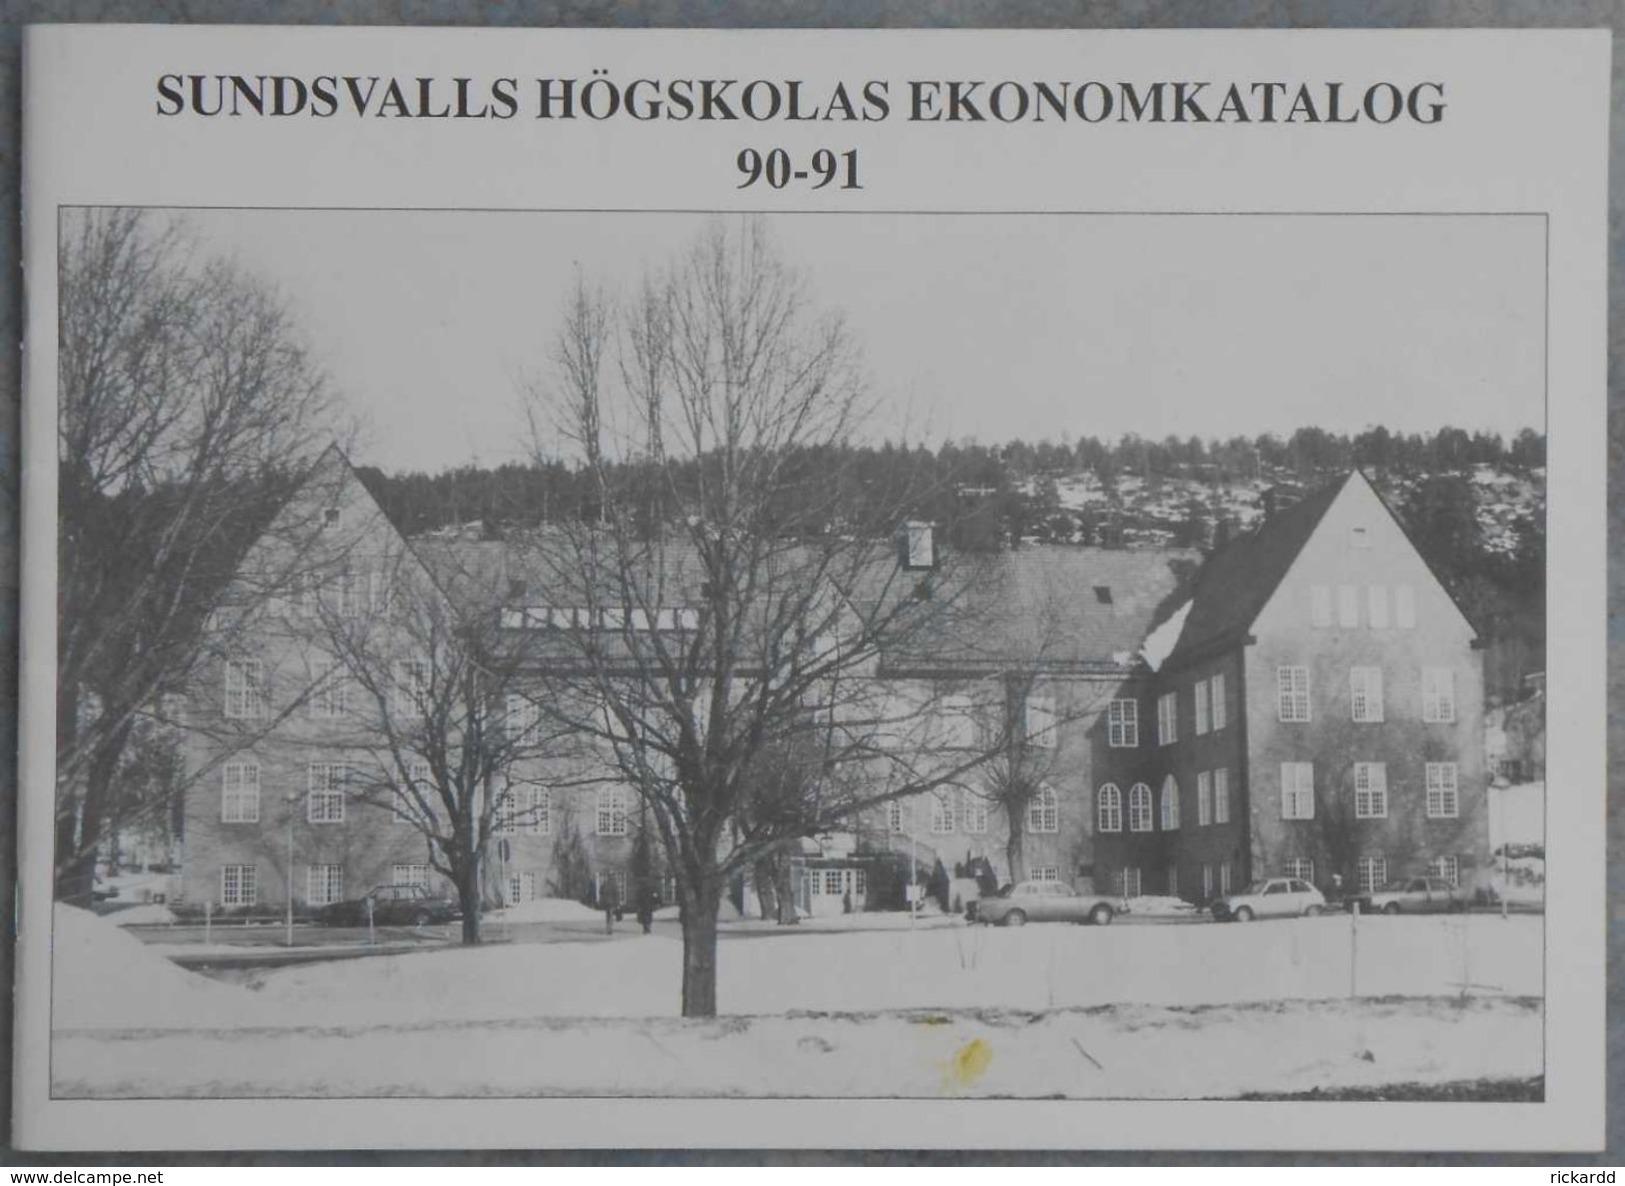 Sundsvalls Högskolas Ekonomkatalog 90-91 - Scandinavian Languages